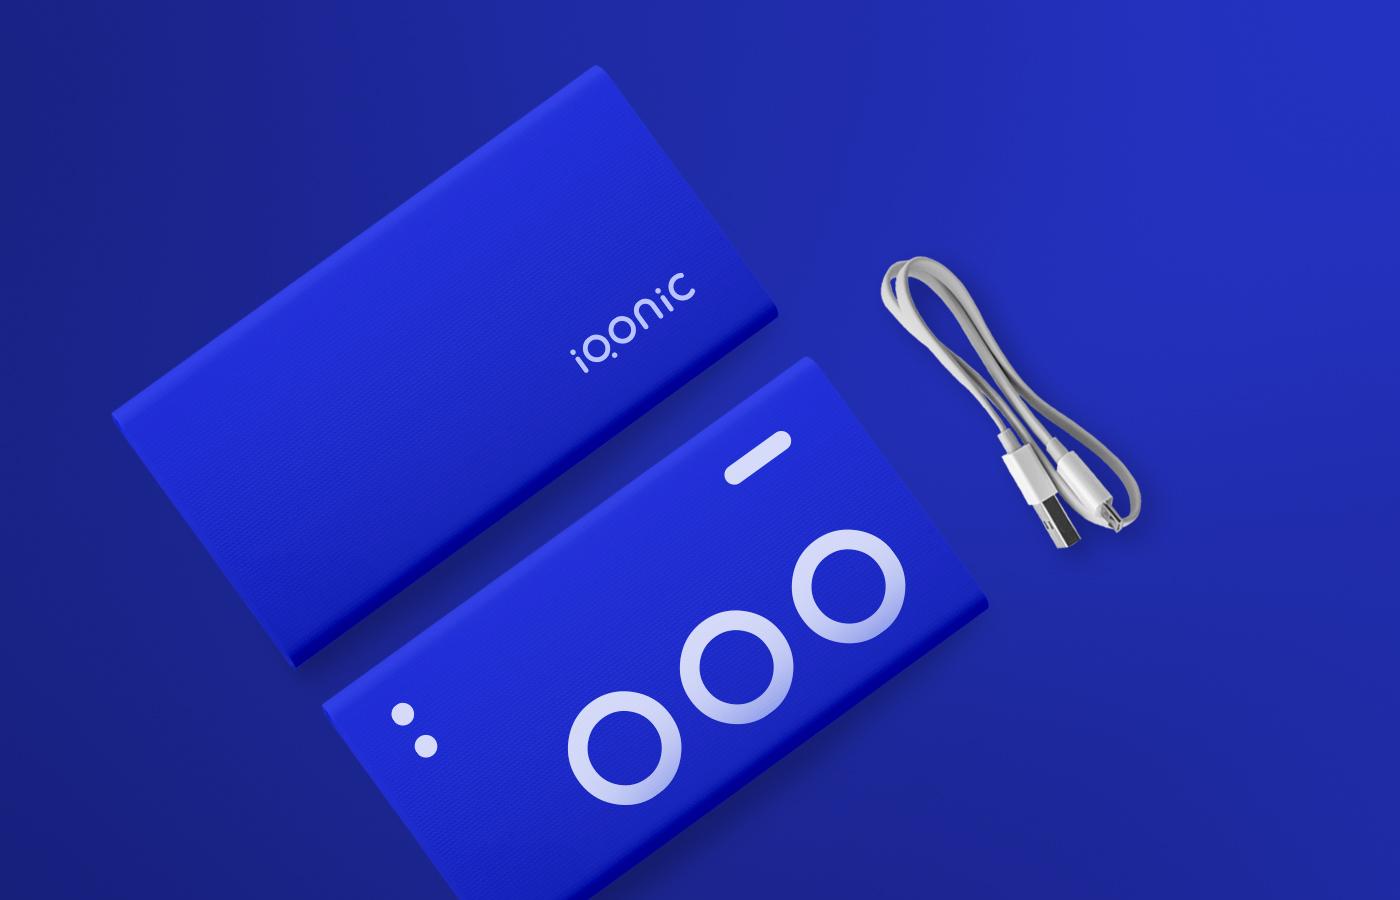 Brand identity system for Iqonic by Alevtyna Makovska 12